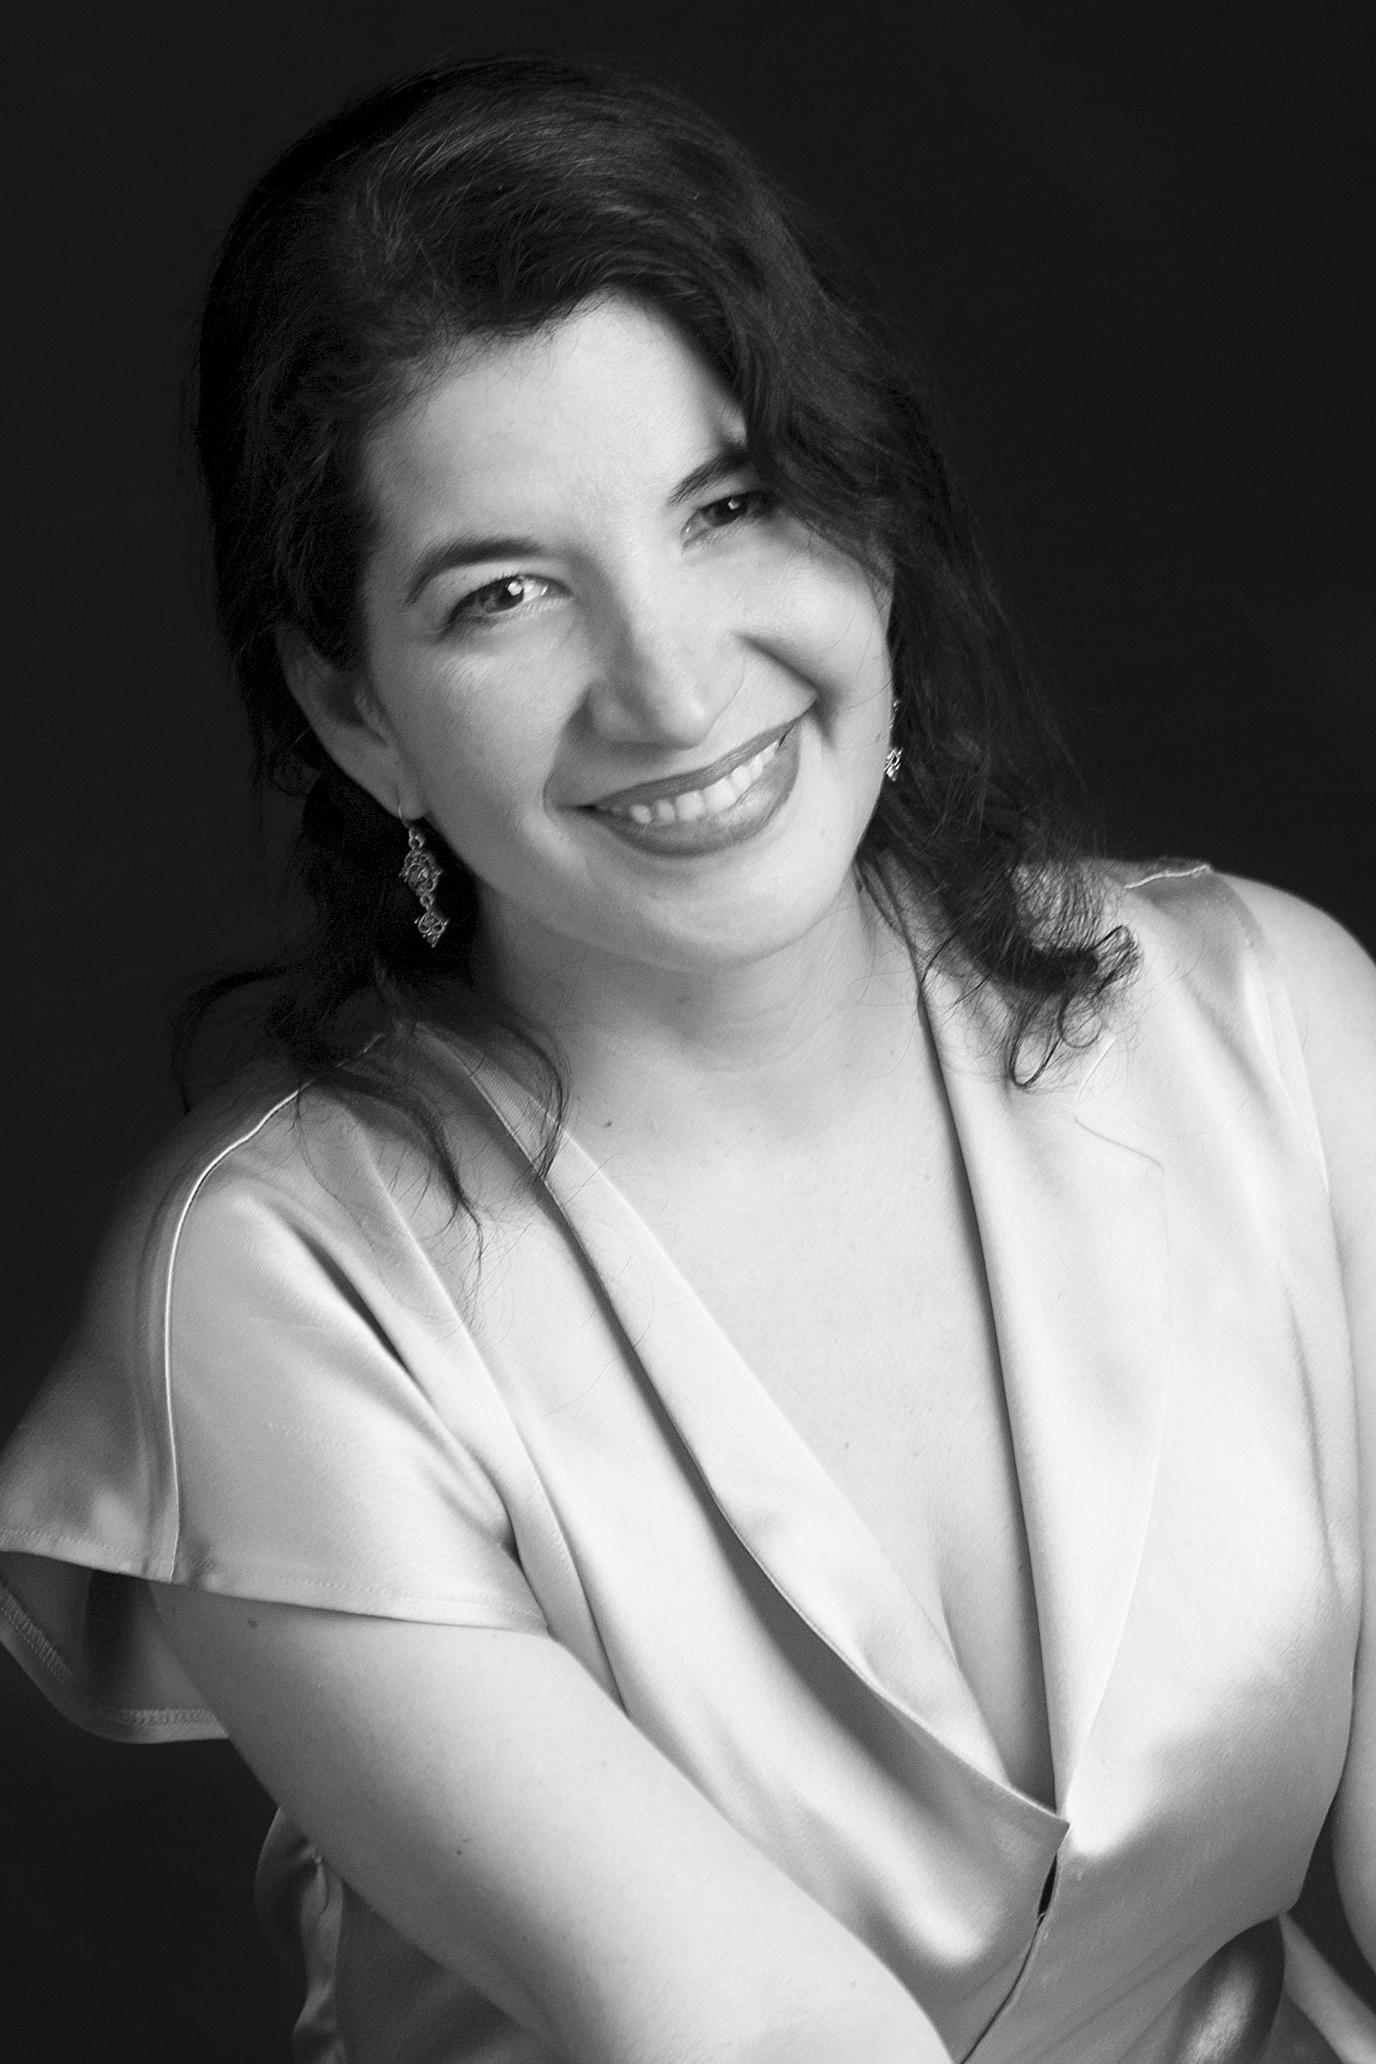 Carolina Alcaide